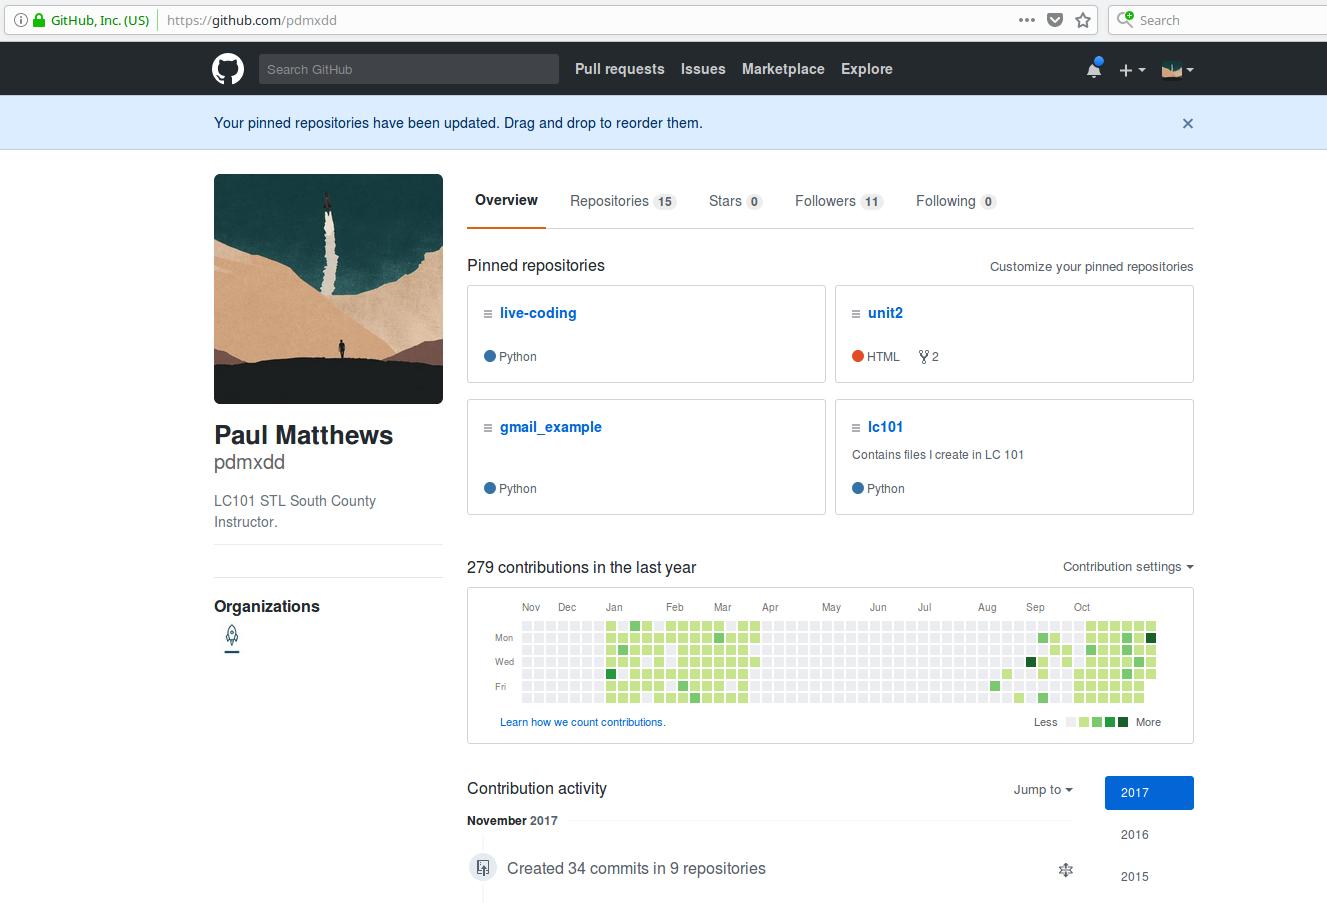 Online Profiles: GitHub — LaunchCode Career Readiness